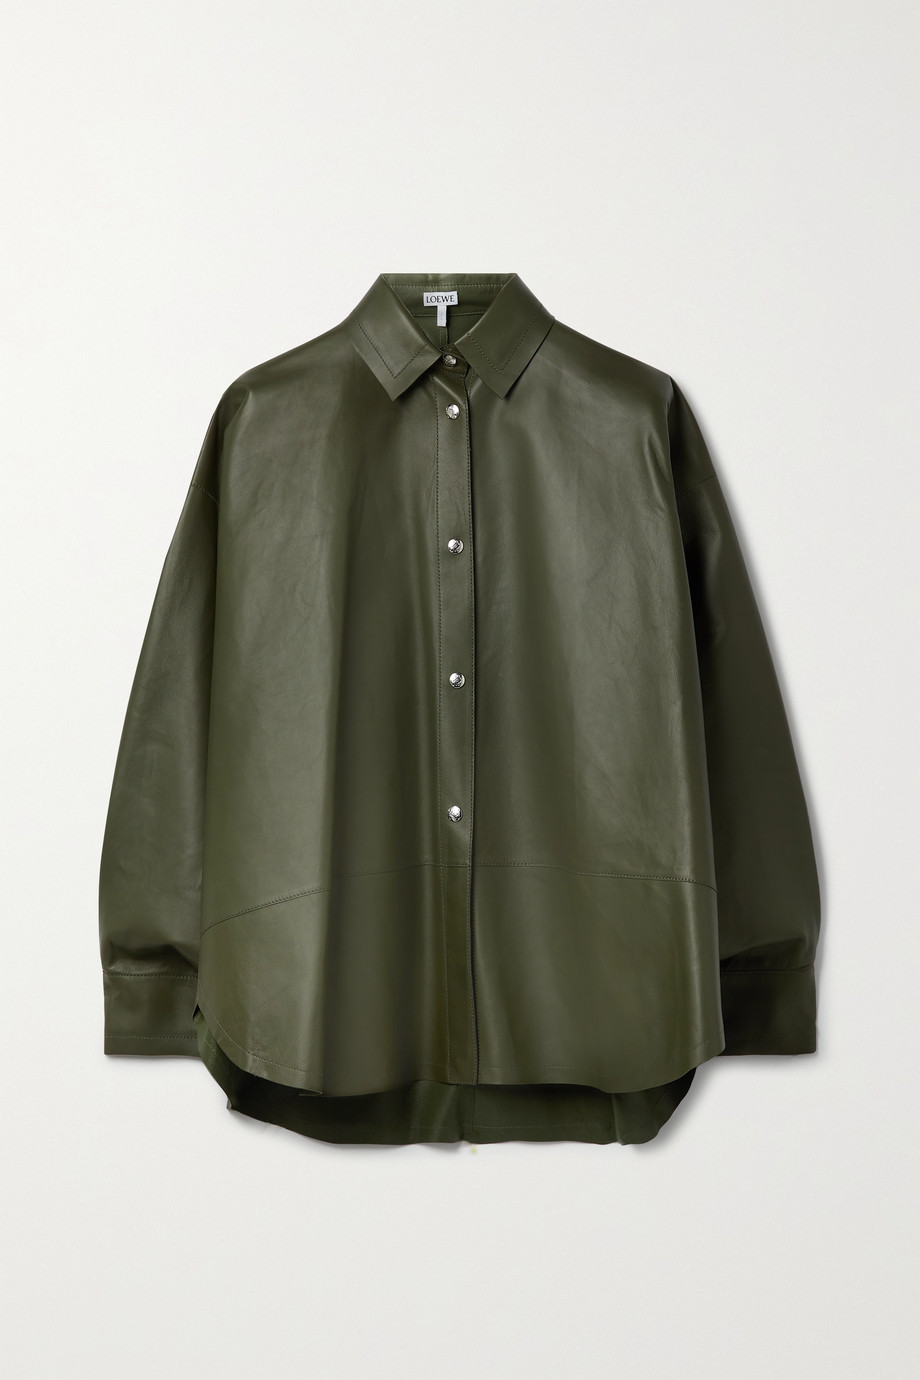 Loewe Oversized leather shirt